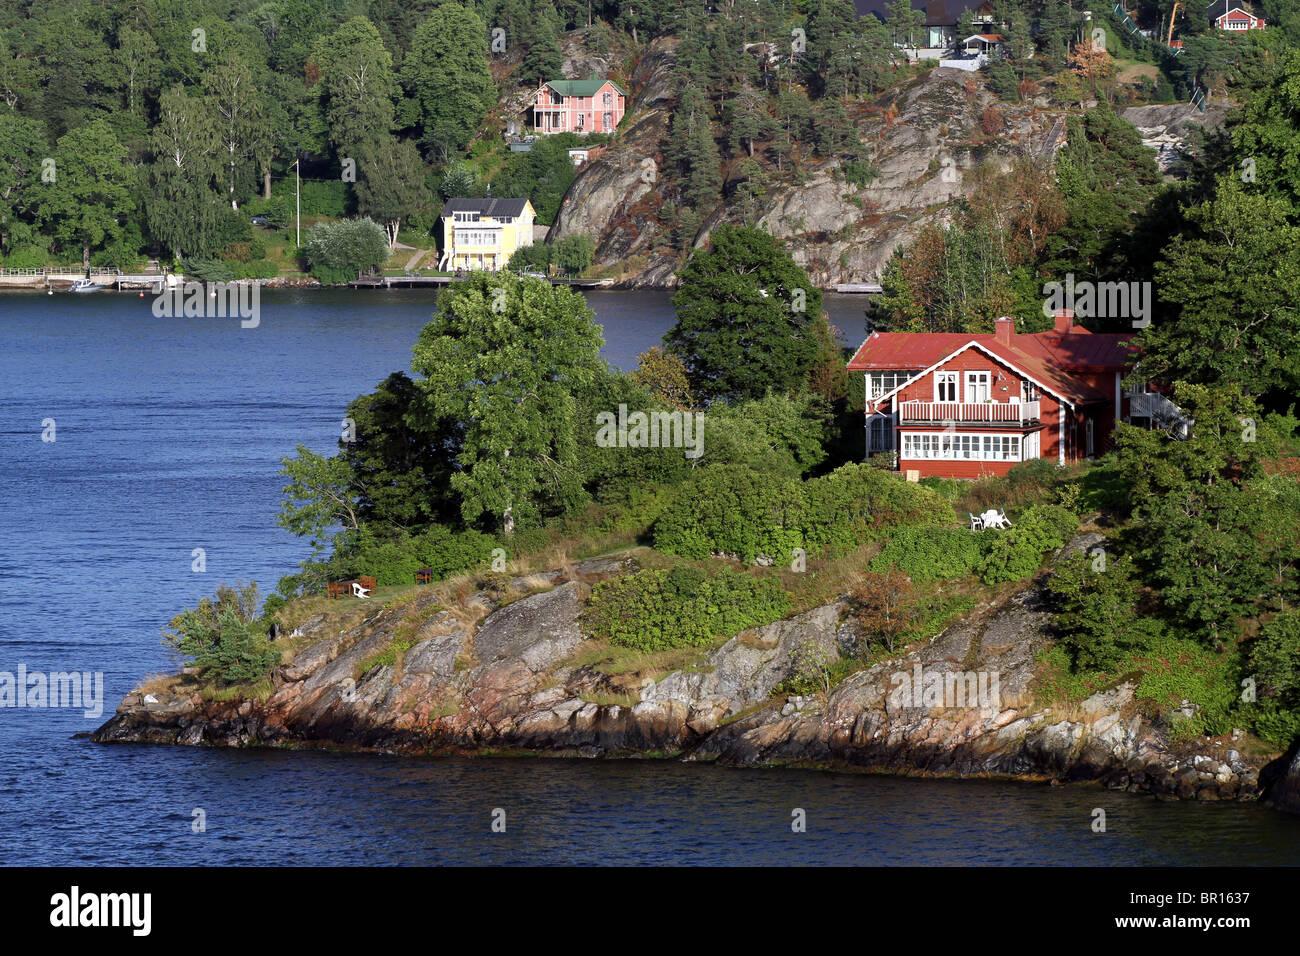 House in the Stockholm Archipelago in Stockholm, Sweden - Stock Image